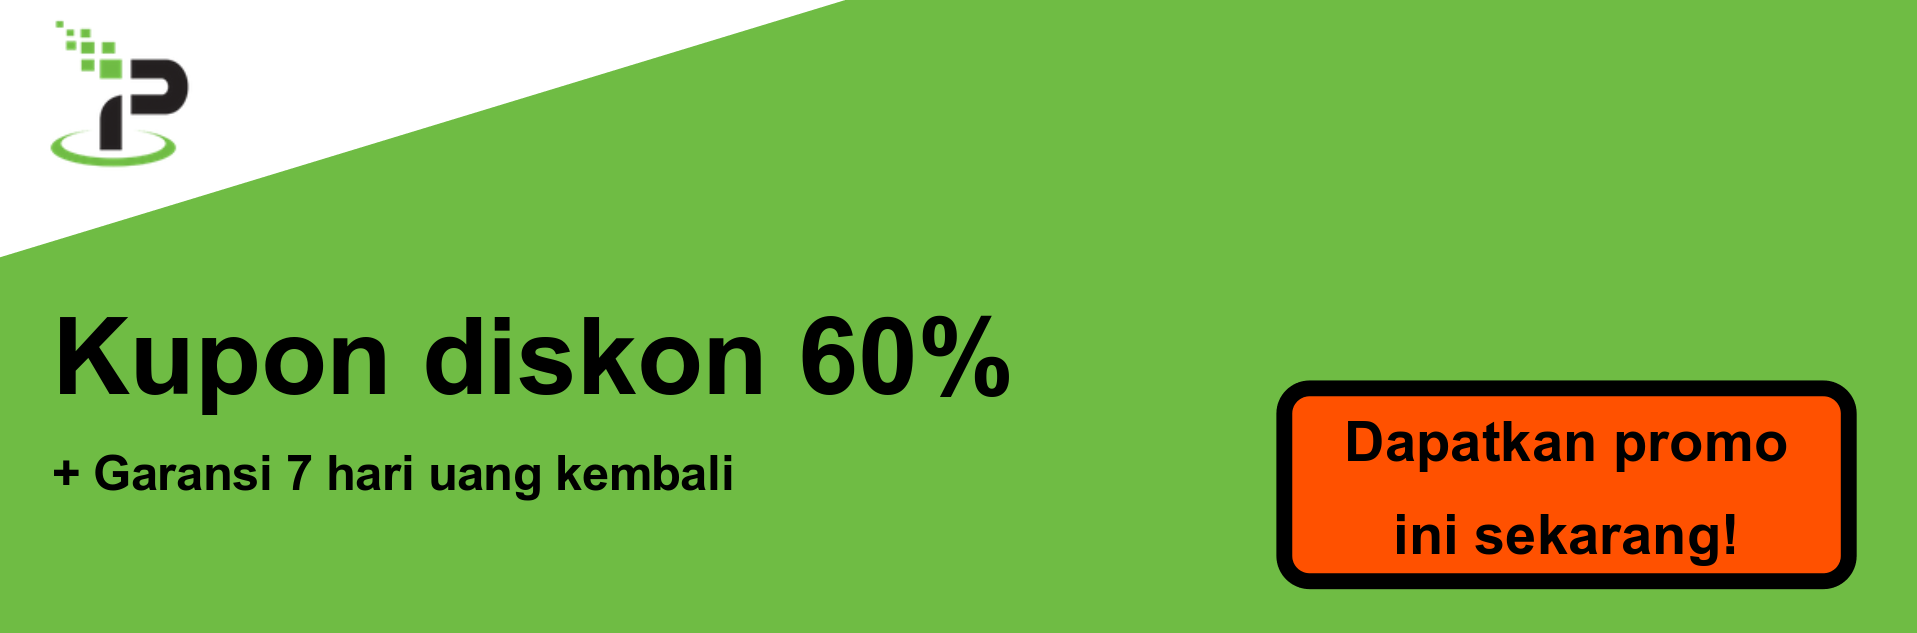 Spanduk kupon IPVanish - diskon 60%